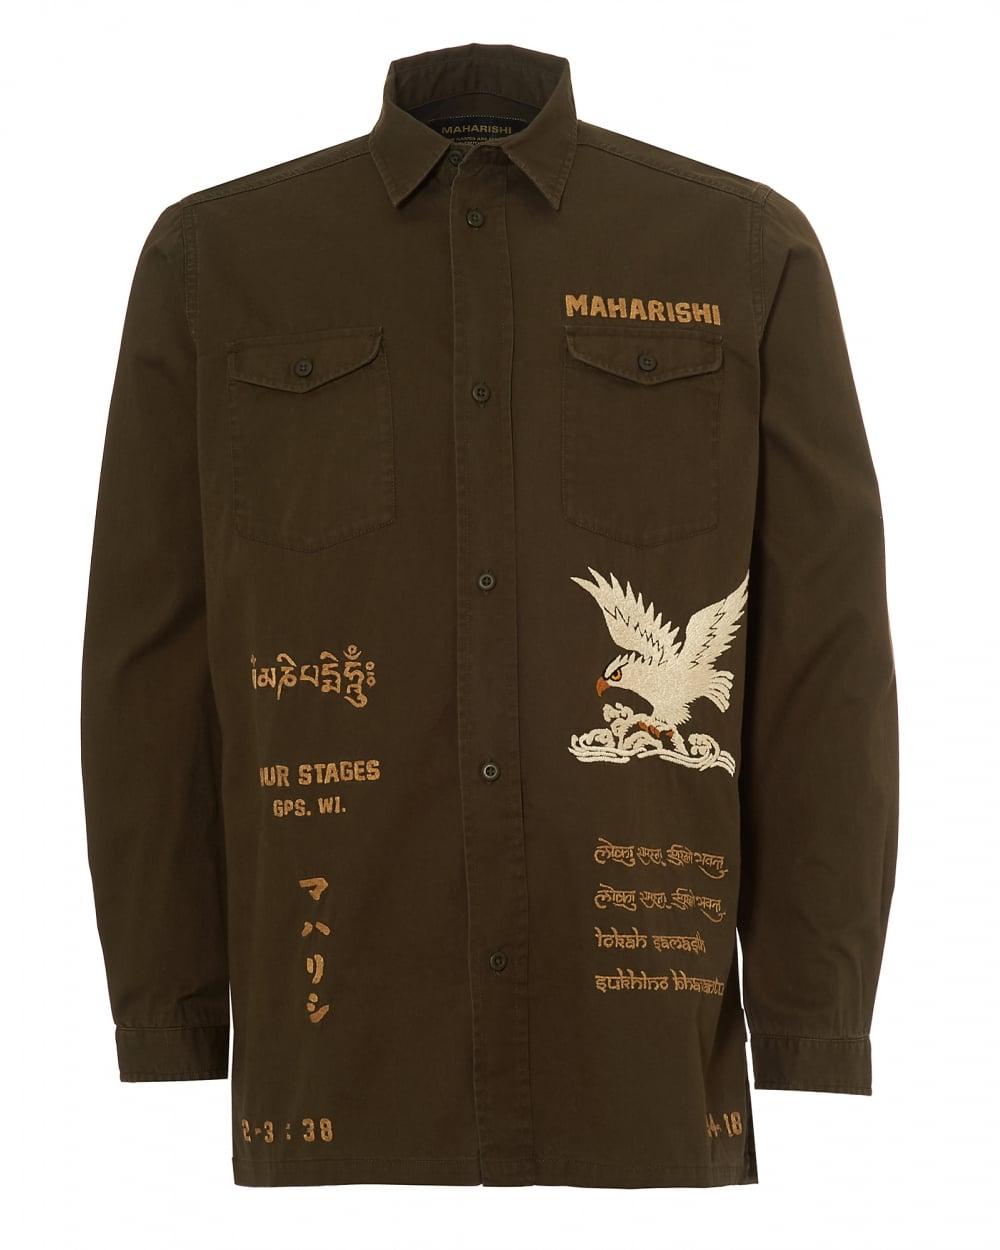 Maharishi mens eagle tour embroidered jacket mill olive overshirt mens eagle tour embroidered jacket mill olive overshirt gumiabroncs Gallery